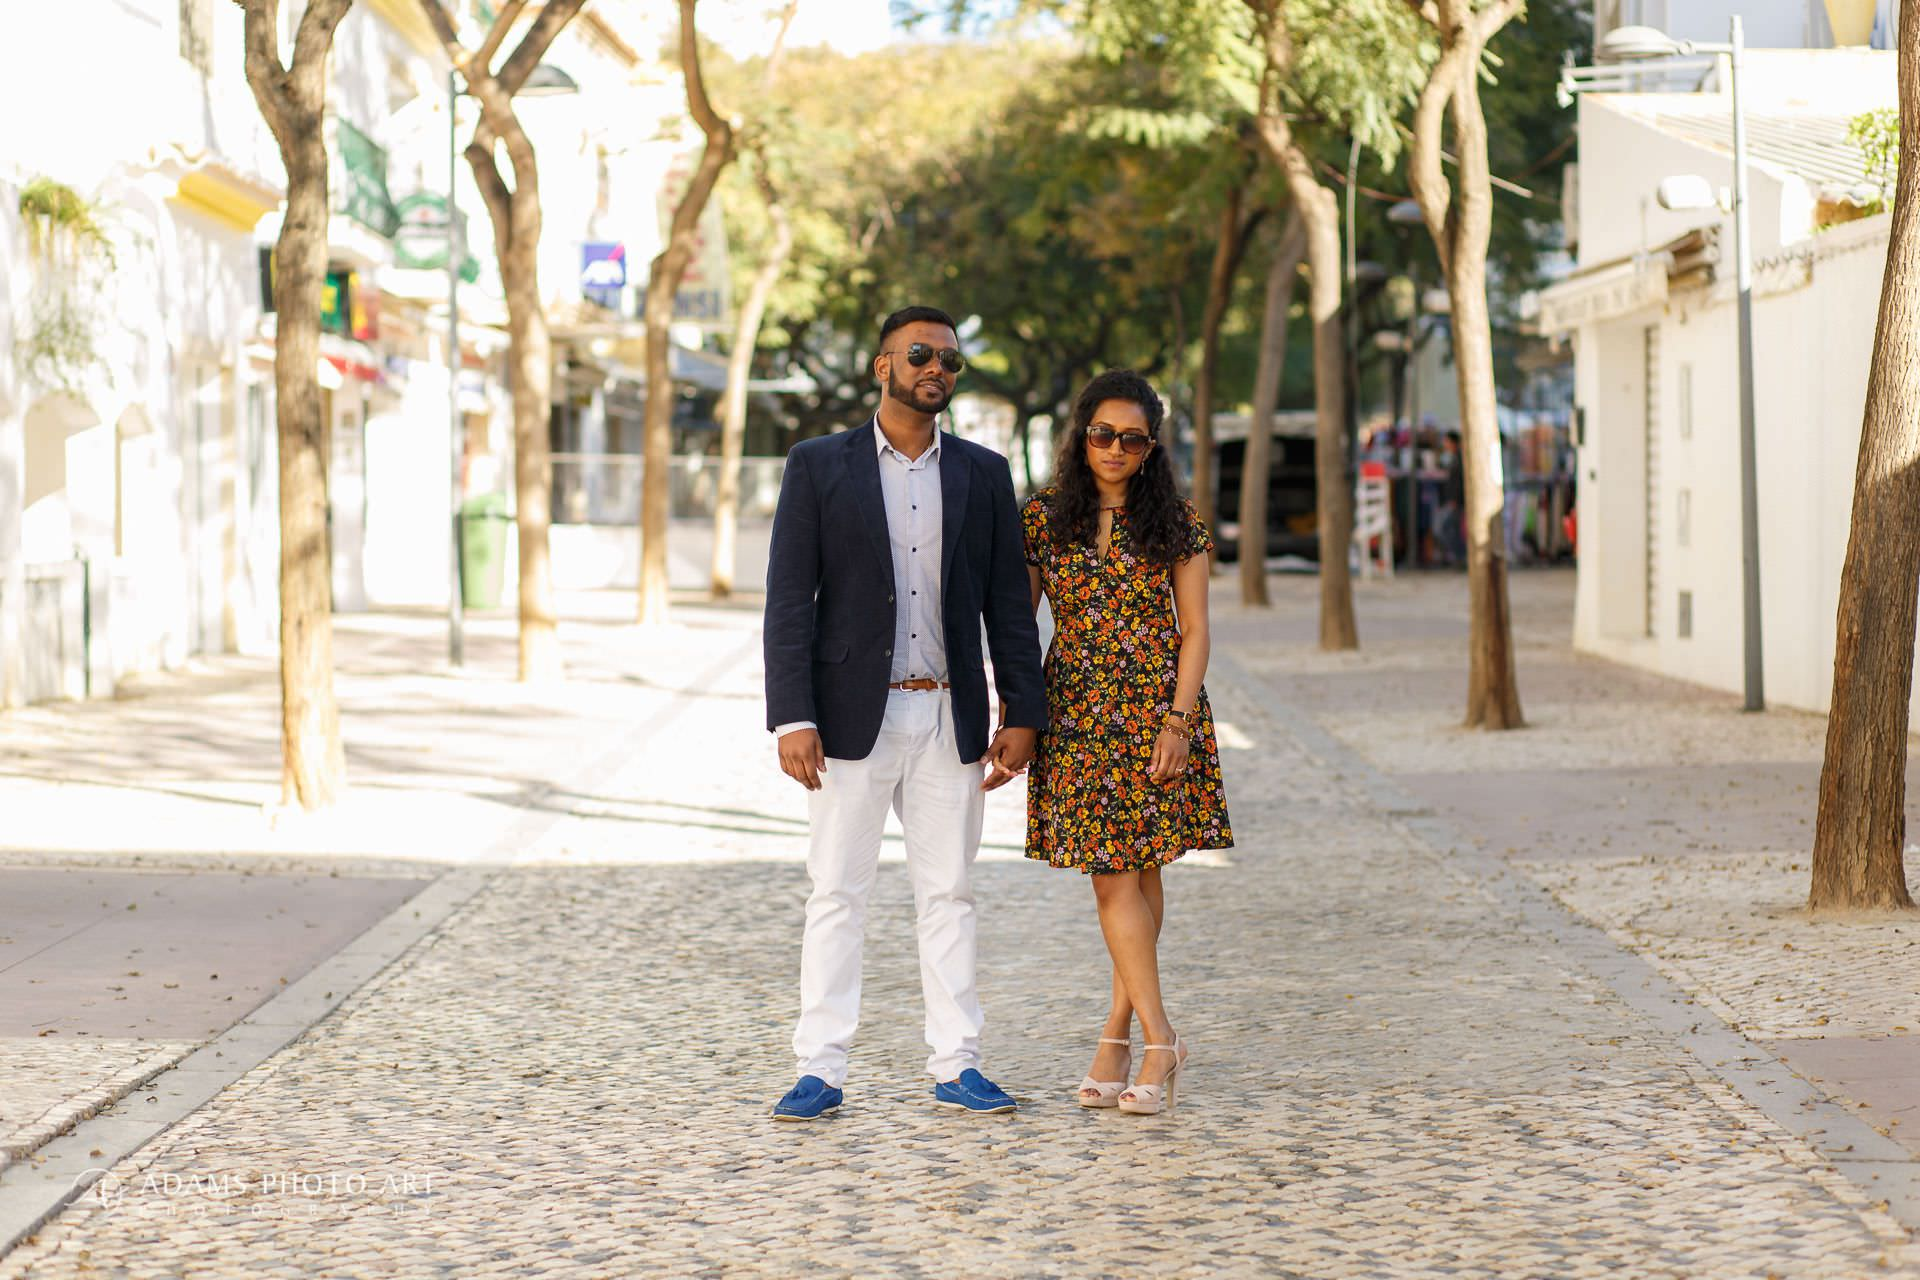 Pre Wedding Photography Algarve Portugal | Saranya + Gobi 29